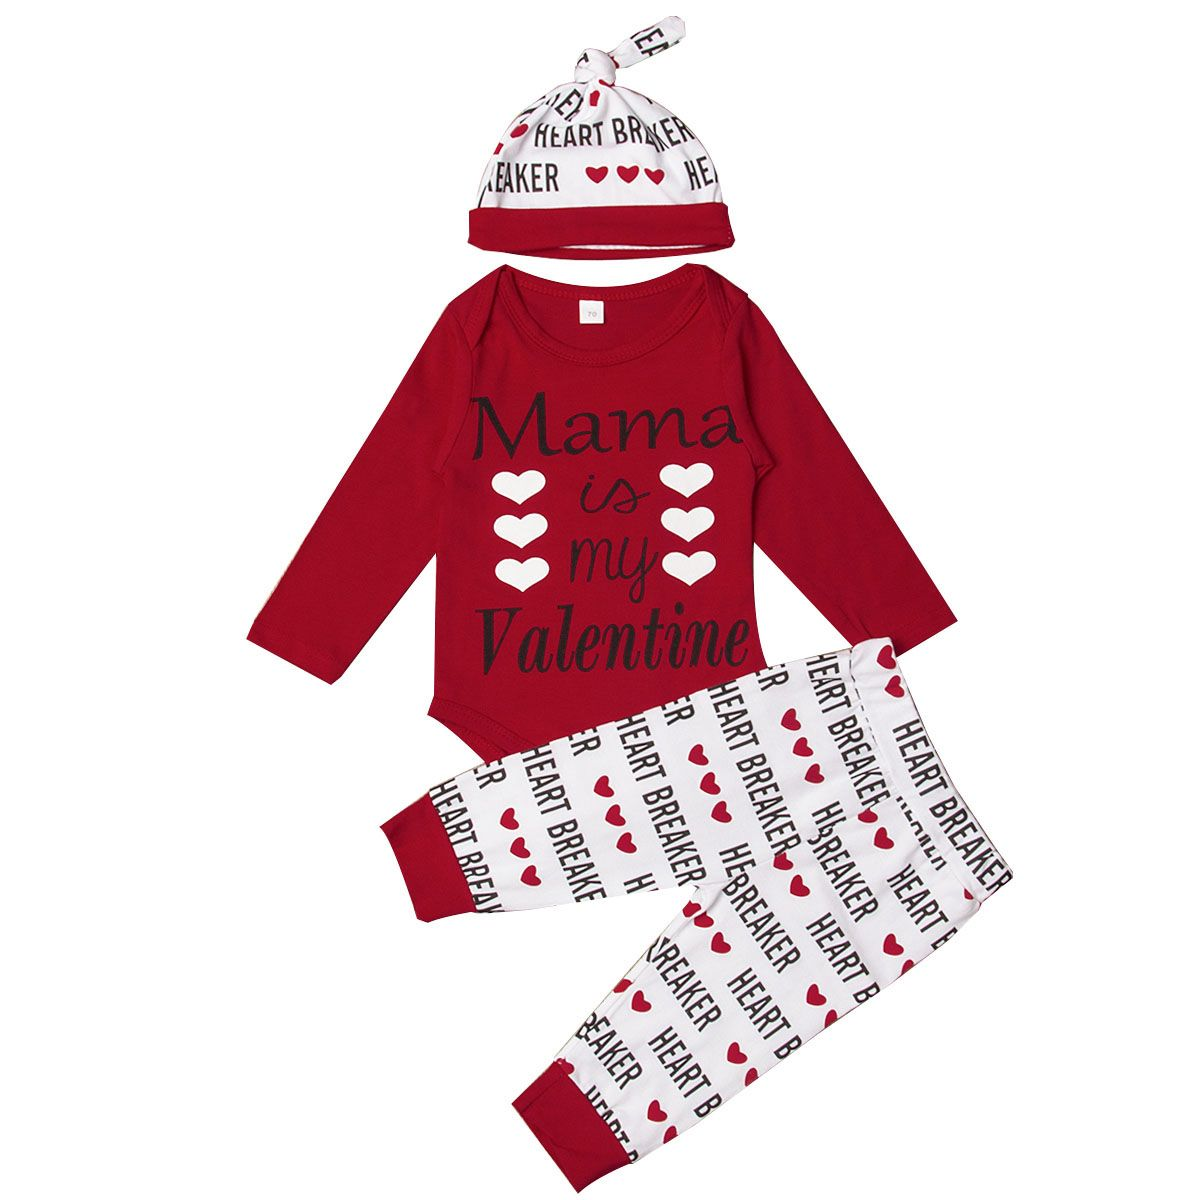 6ea2644f 2019 Fashion Mama is my Valentine Newborn Baby Girl Boy 3pcs Clothes Tops  Letter Heart Print Romper Pants Set